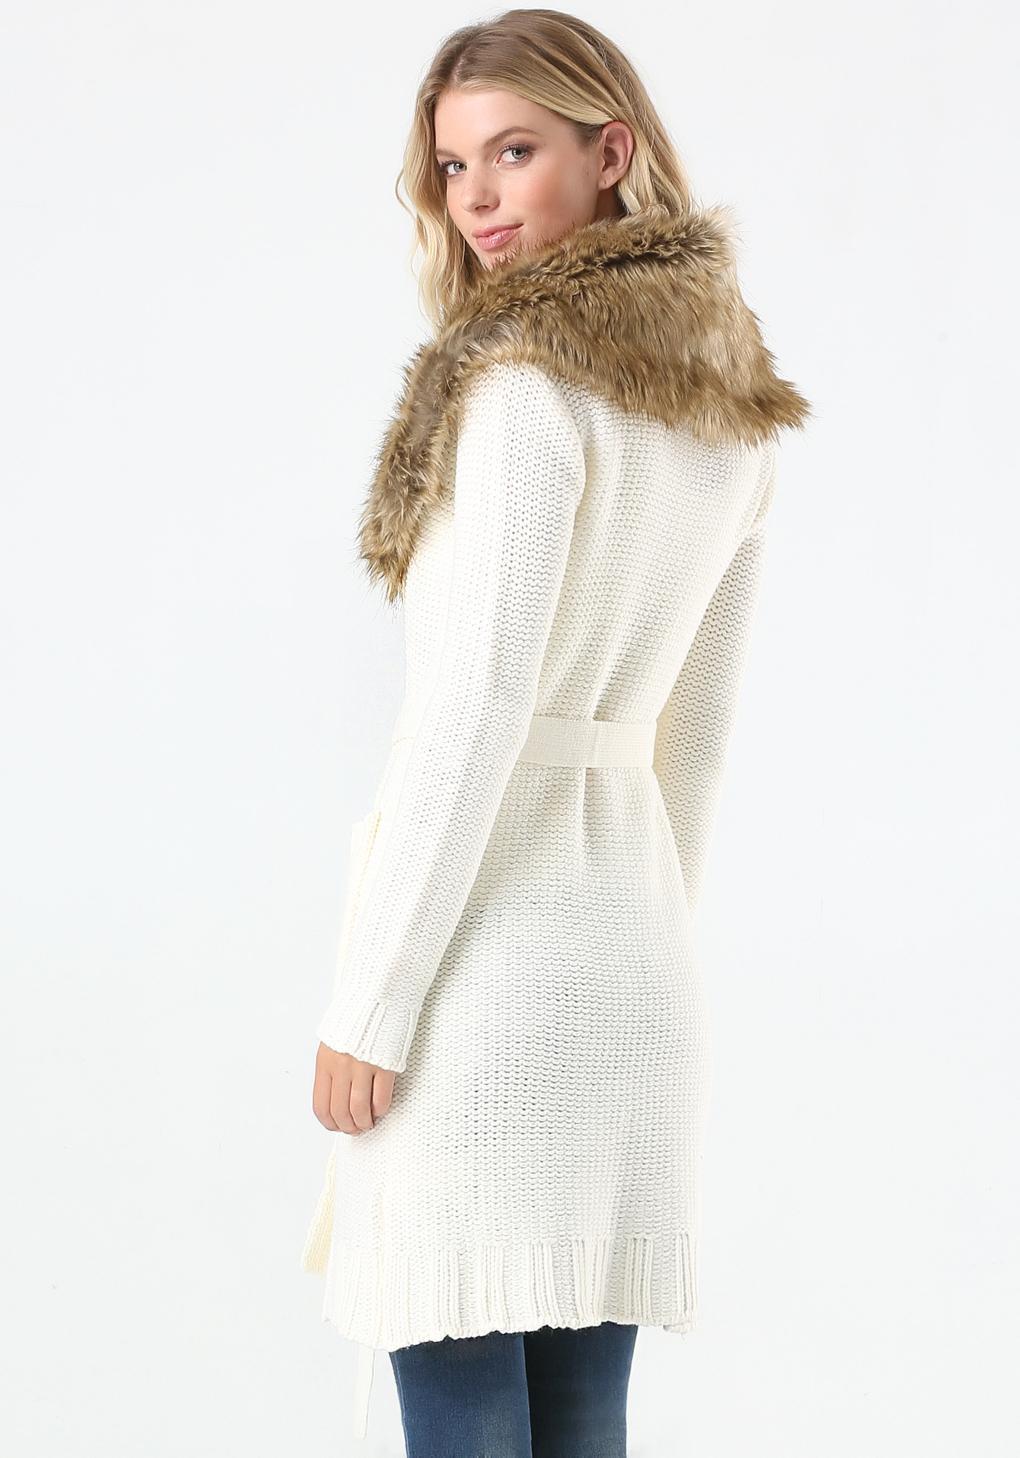 Bebe Faux Fur Trim Sweater Coat In White Lyst